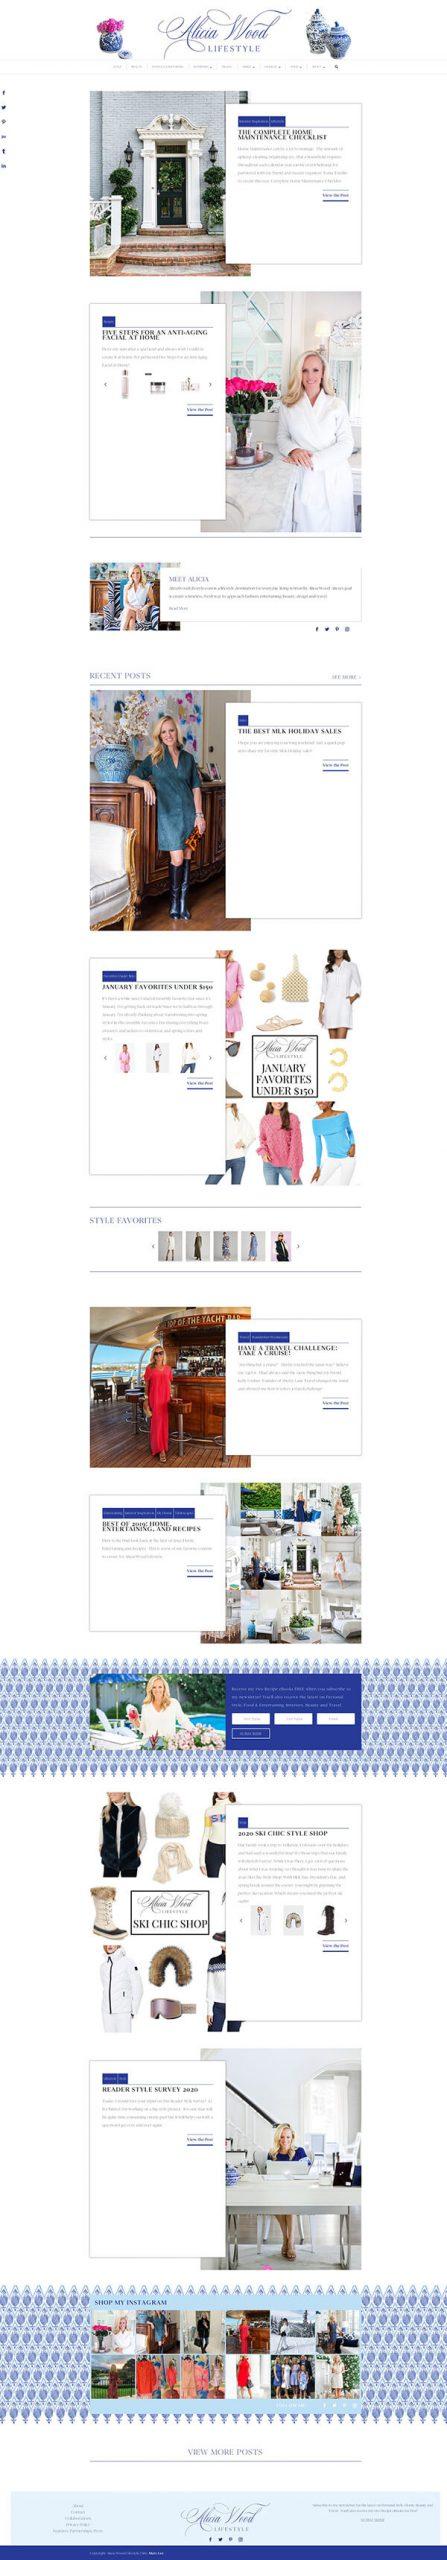 Alicia Wood Lifestyle website